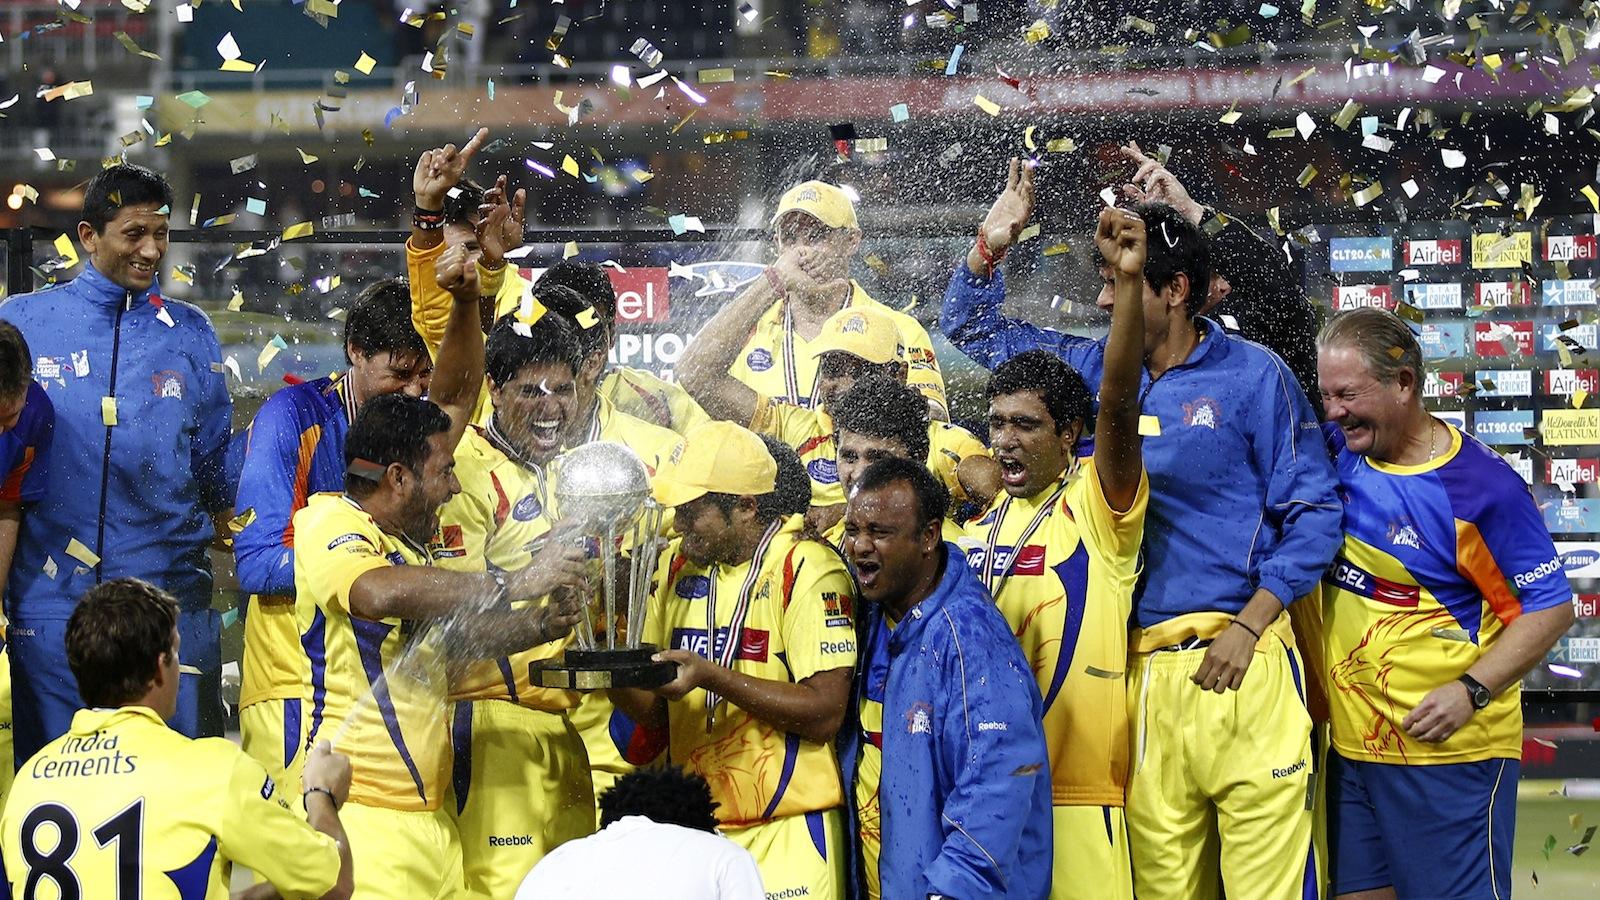 Cricket-BCCI-Corruption